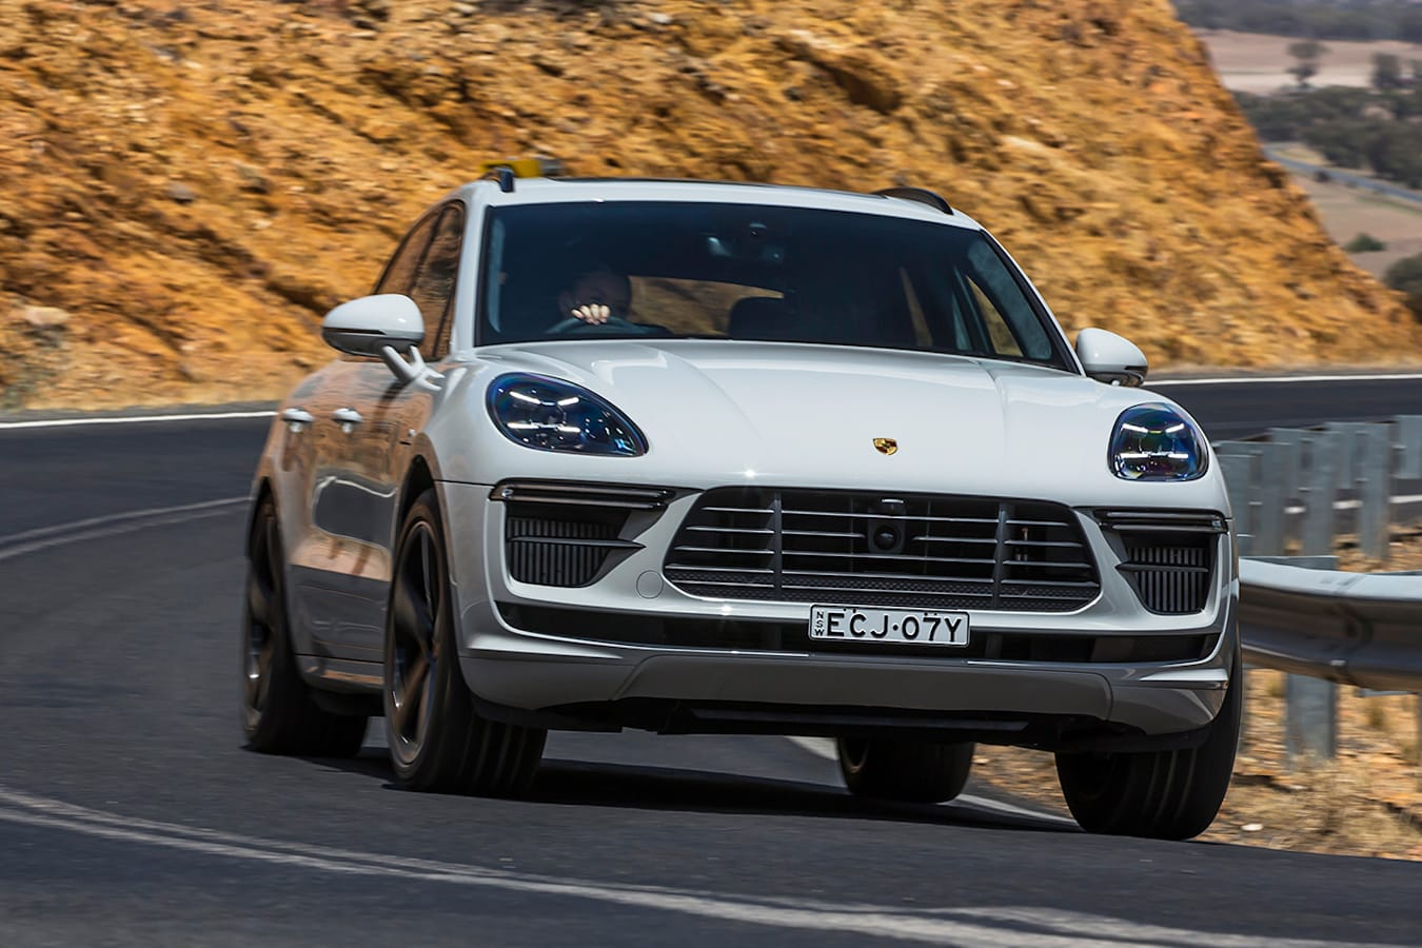 2020 Porsche Macan Turbo Review 6 Jpg